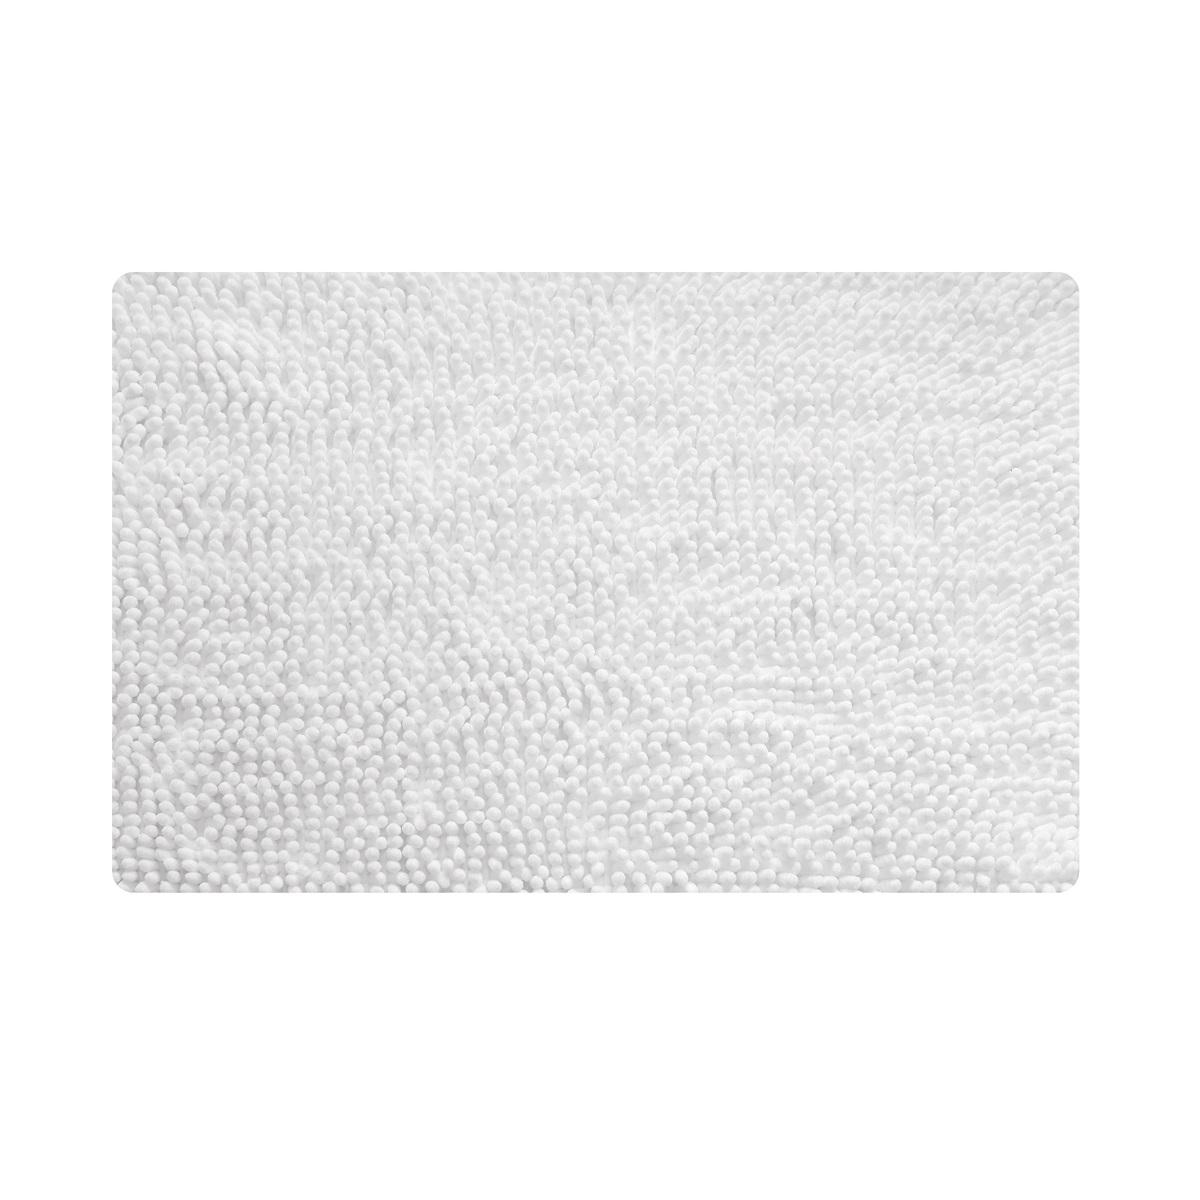 Коврик для ванной Iddis White leaf, цвет: белый, 50 х 80 см коврик дл ванной iddis leaf mid250a